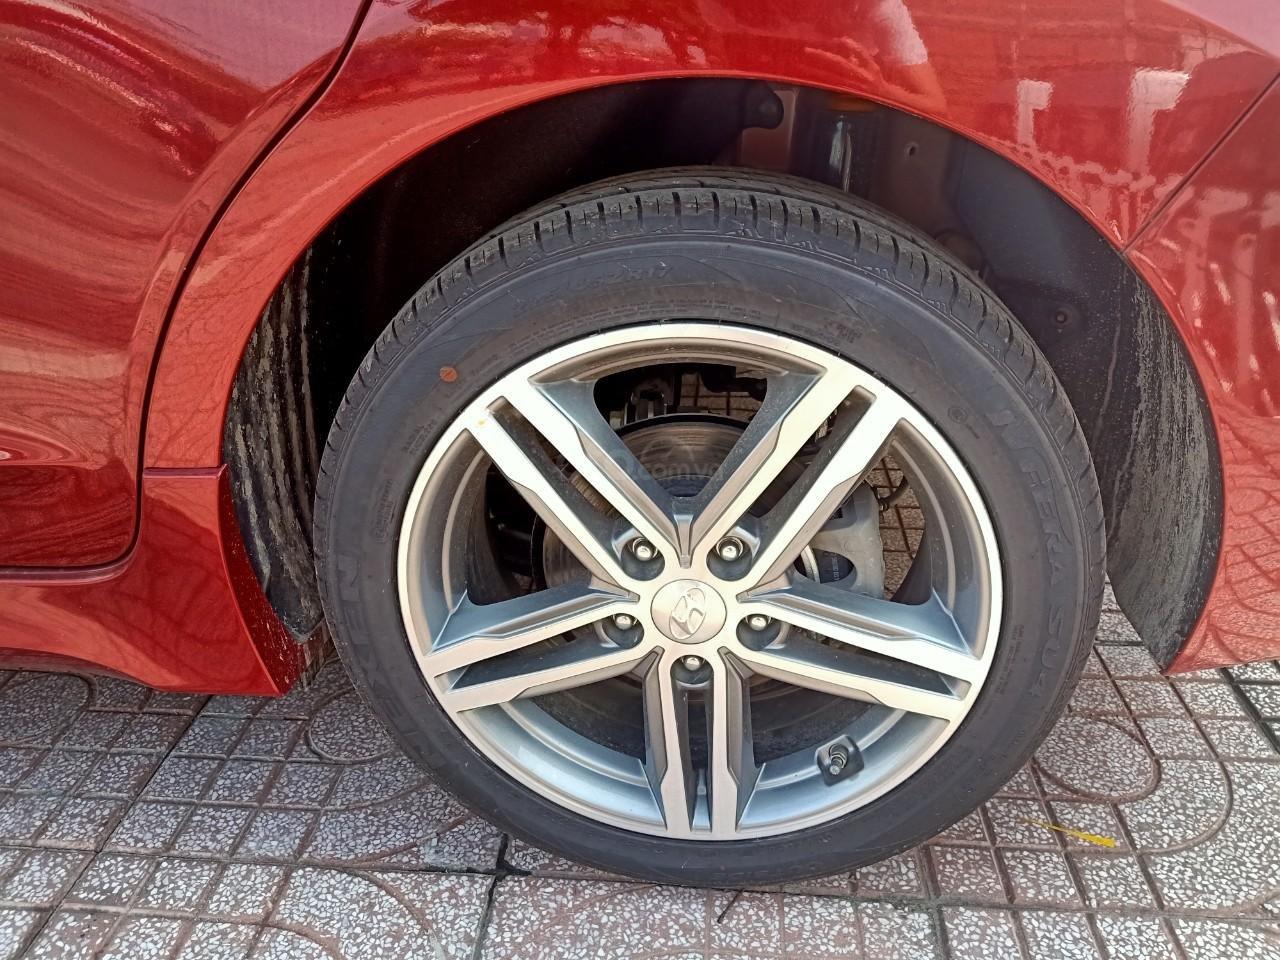 Hyundai Elantra 1.6AT Sport đỏ+ Sale sốc KM 40 triệu+ xe giao ngay (5)